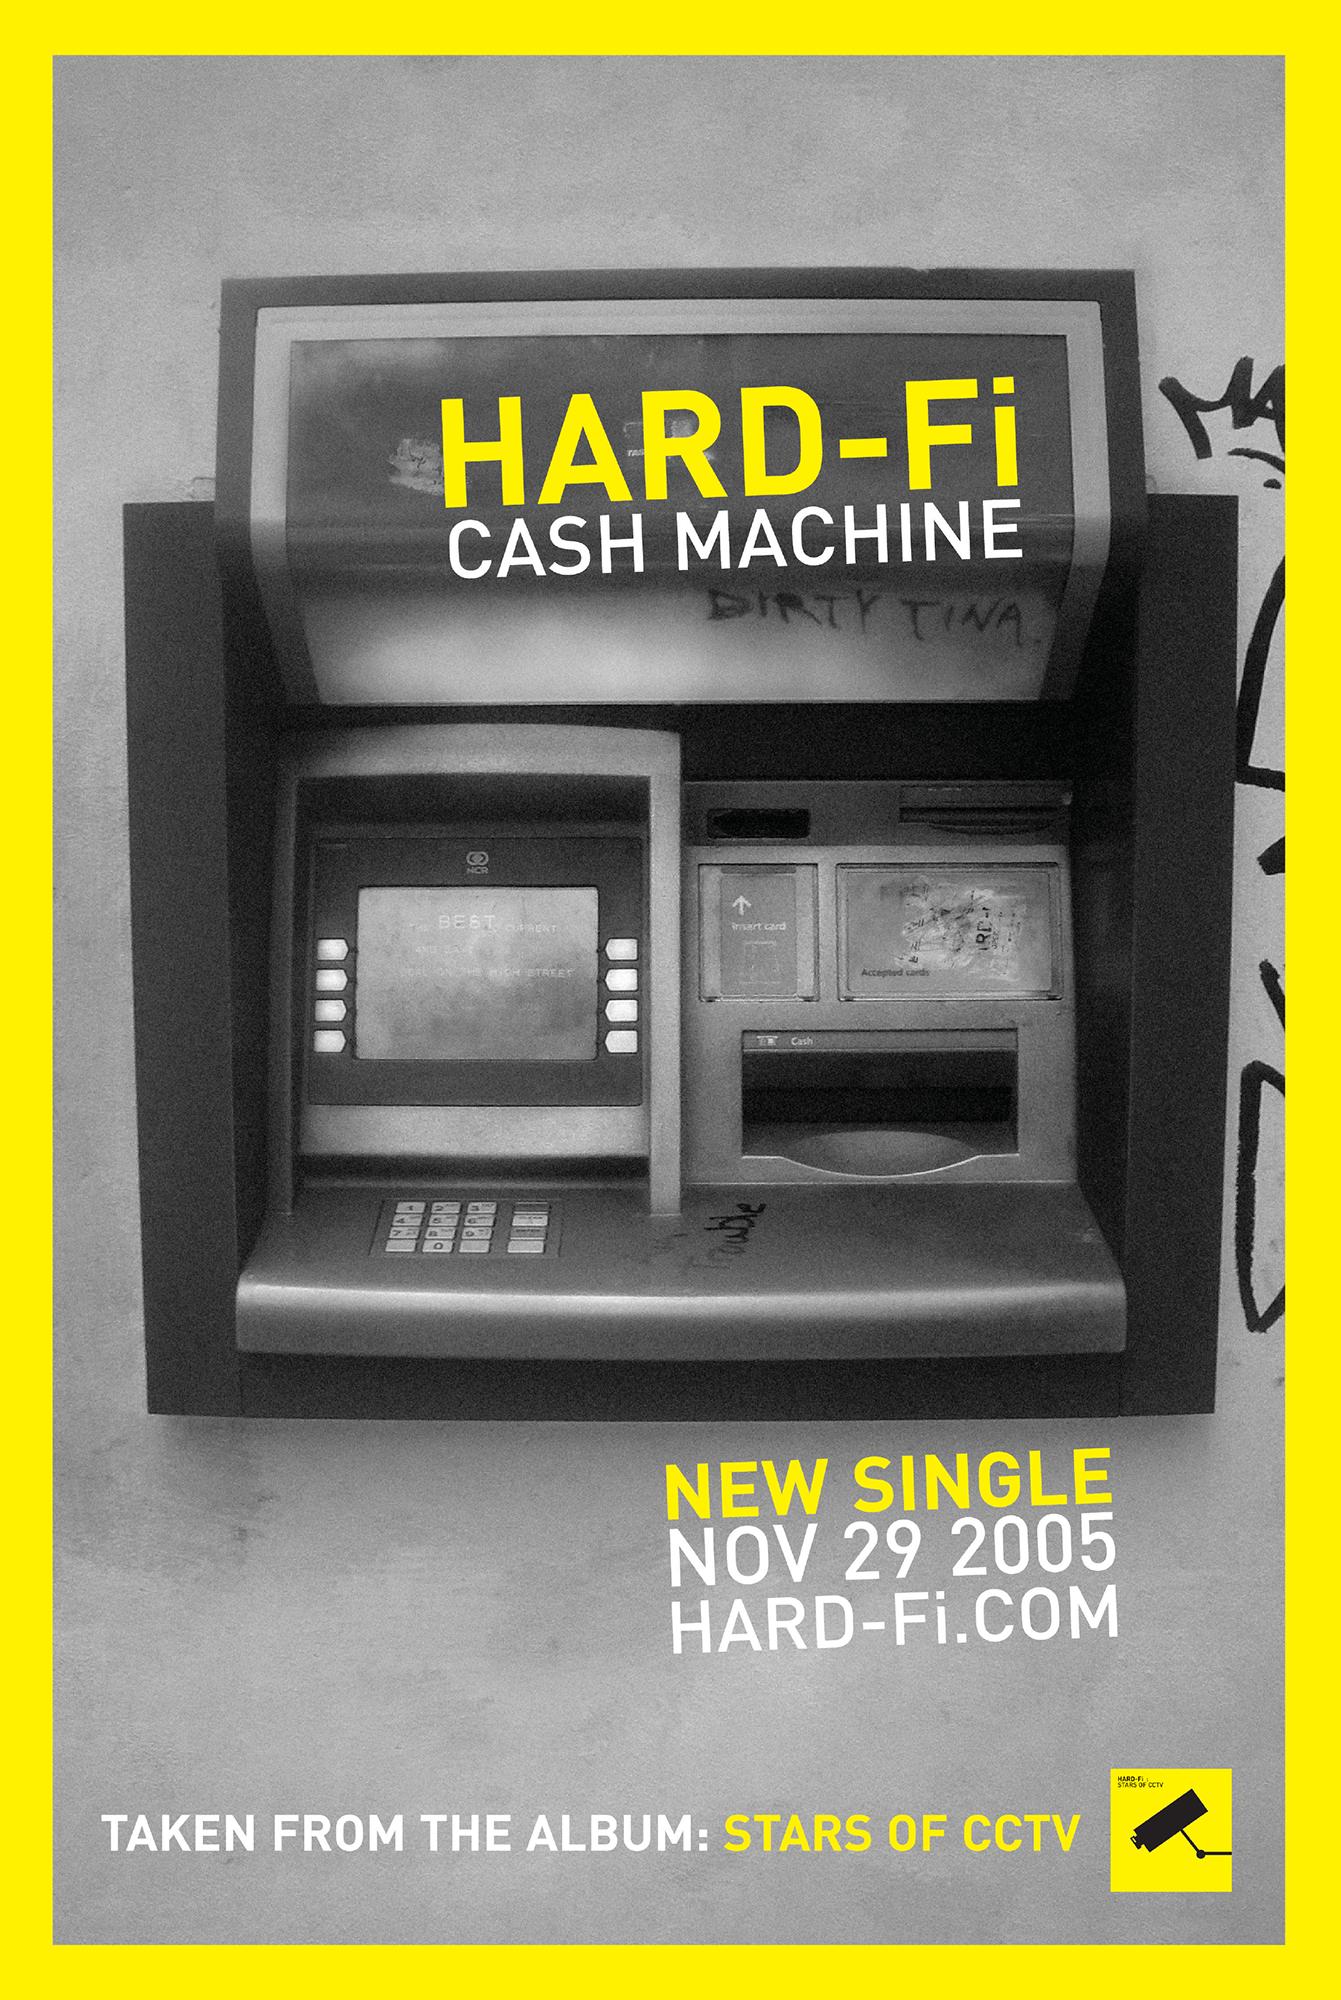 HardFi_work-15.png